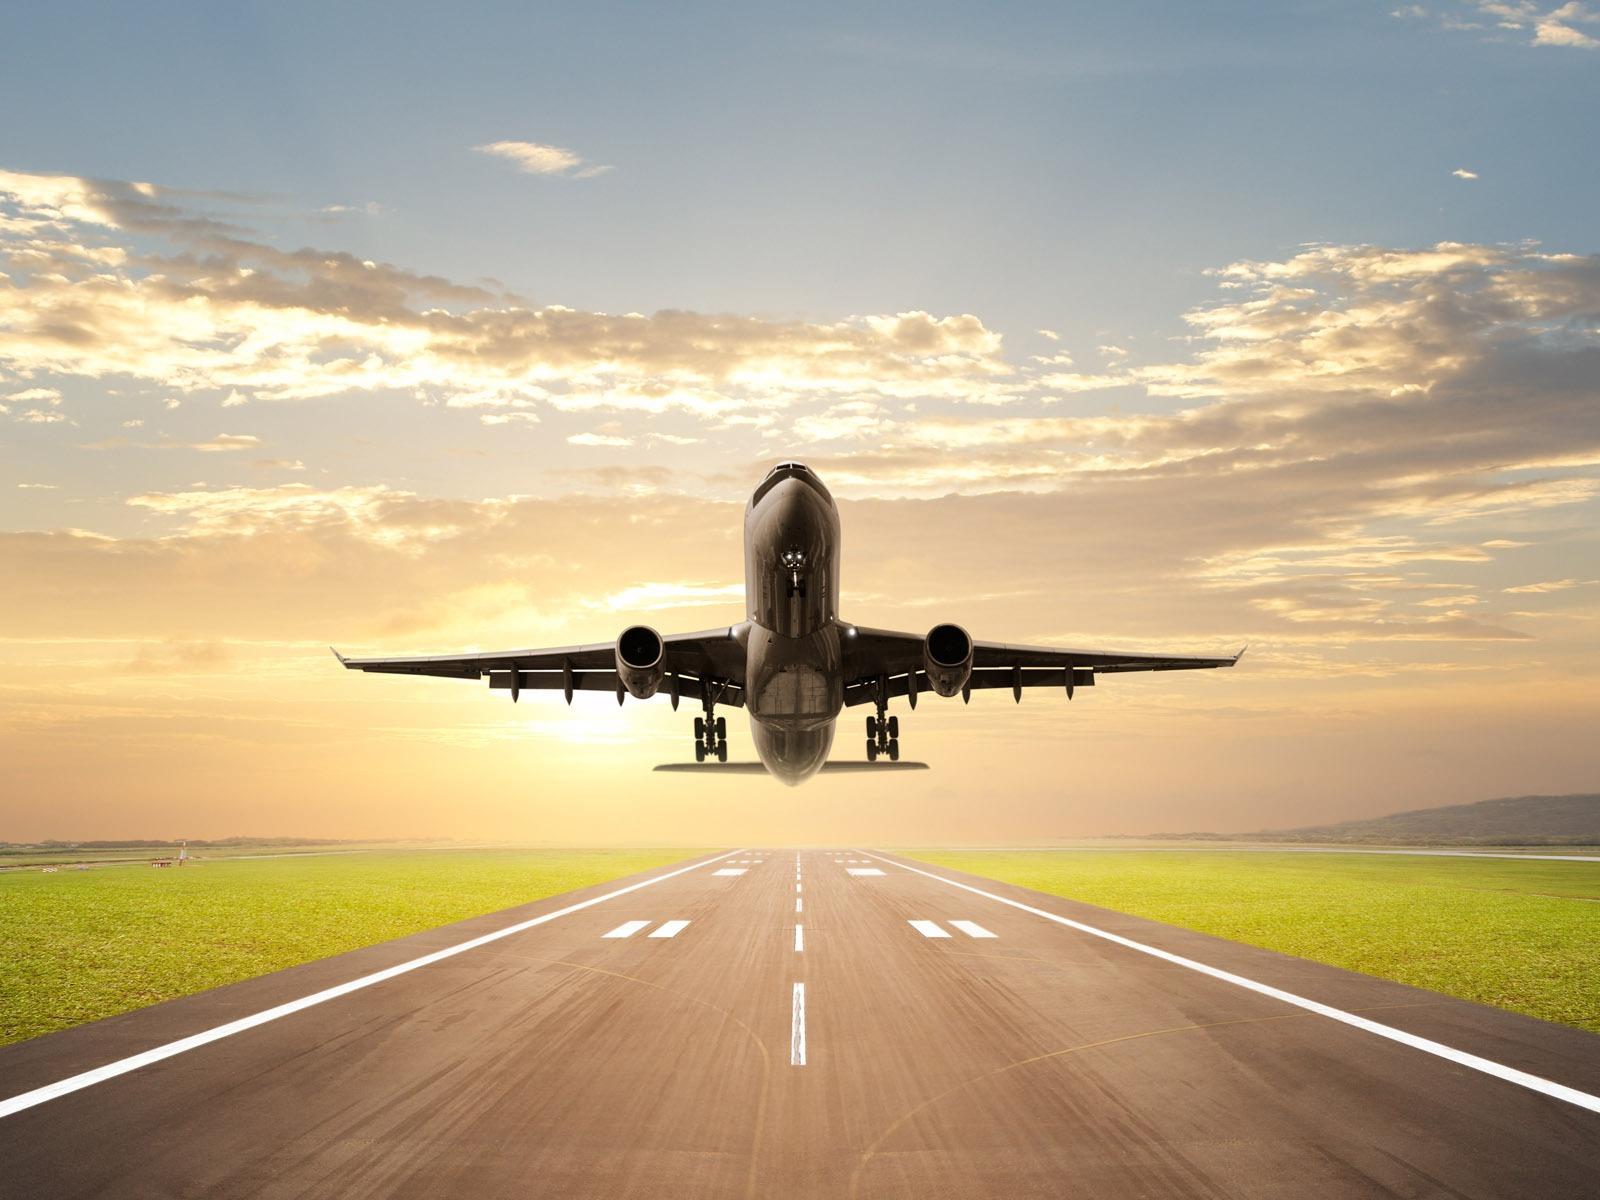 inchirieri-auto-aeroport-timisoara-west-rent-a-car